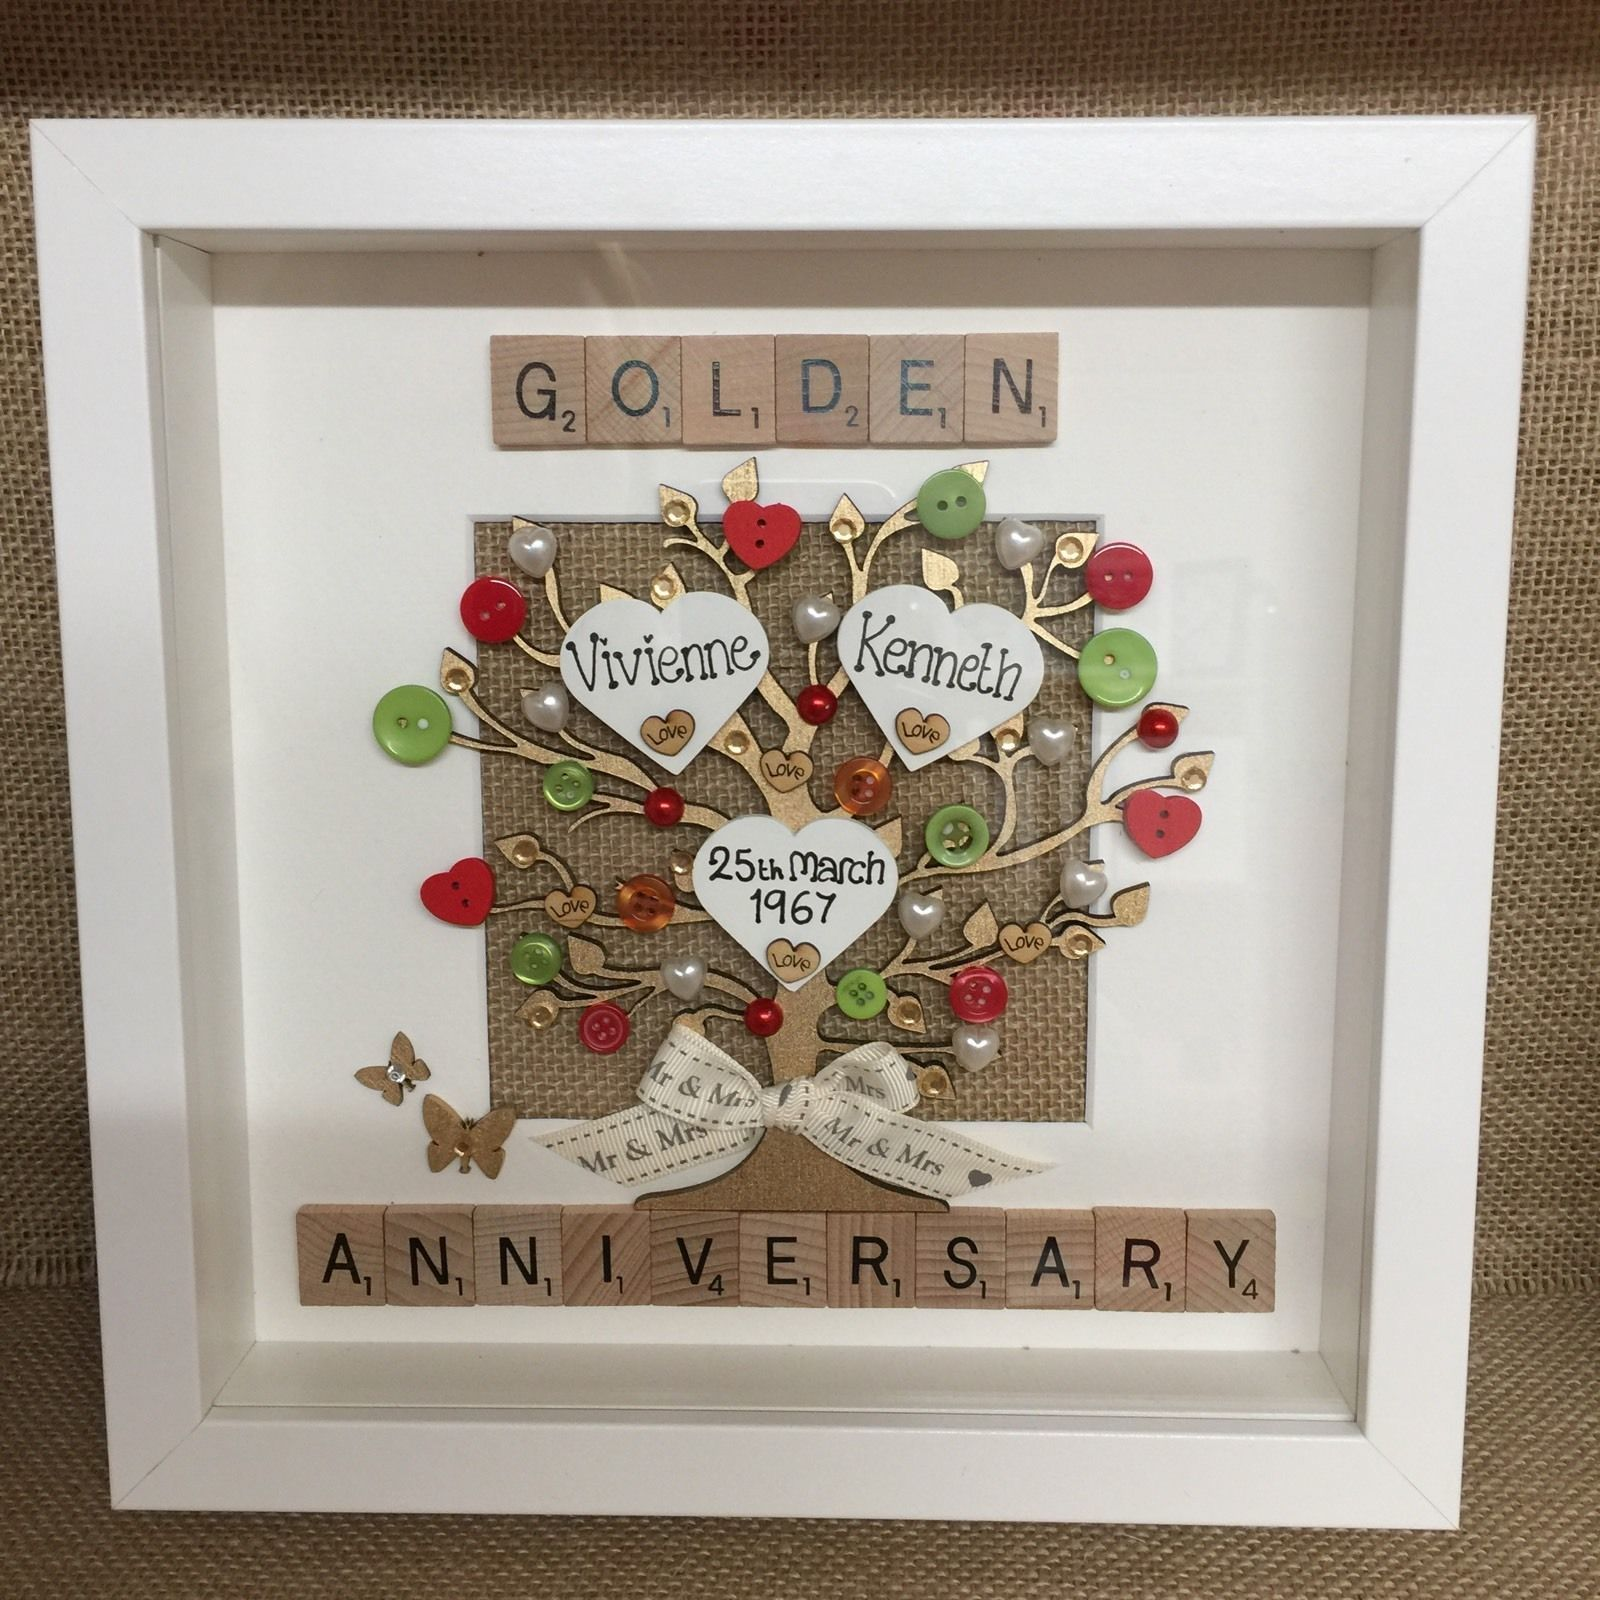 Golden Wedding Gift Ideas Uk: Details About BOX FRAME SCRABBLE LETTERS RUBY GOLDEN